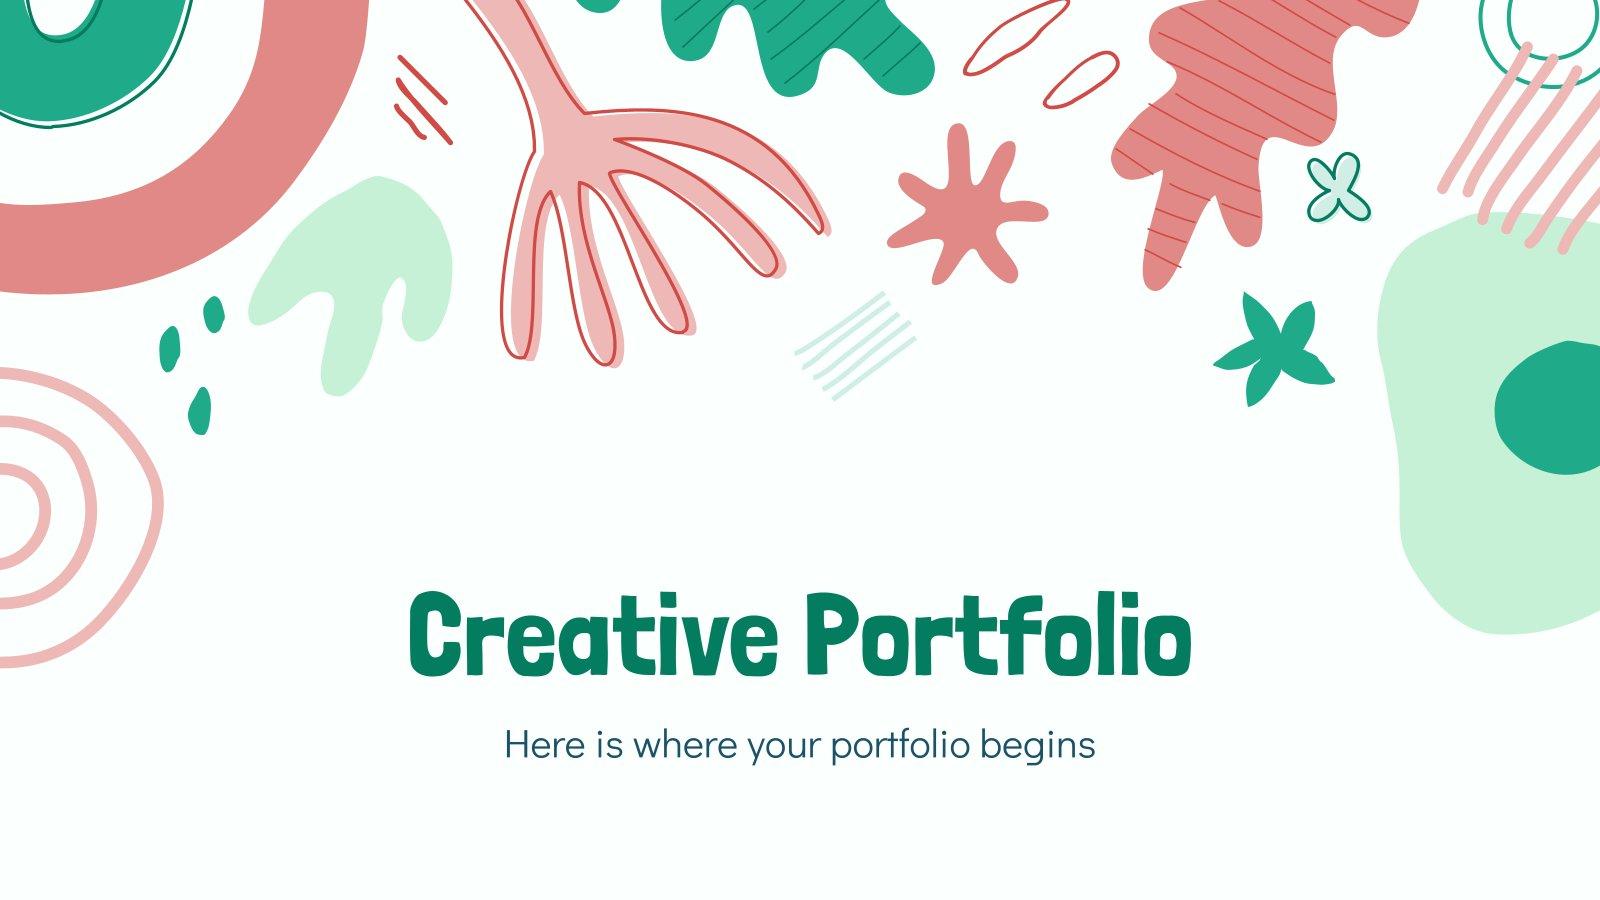 Creative Portfolio presentation template